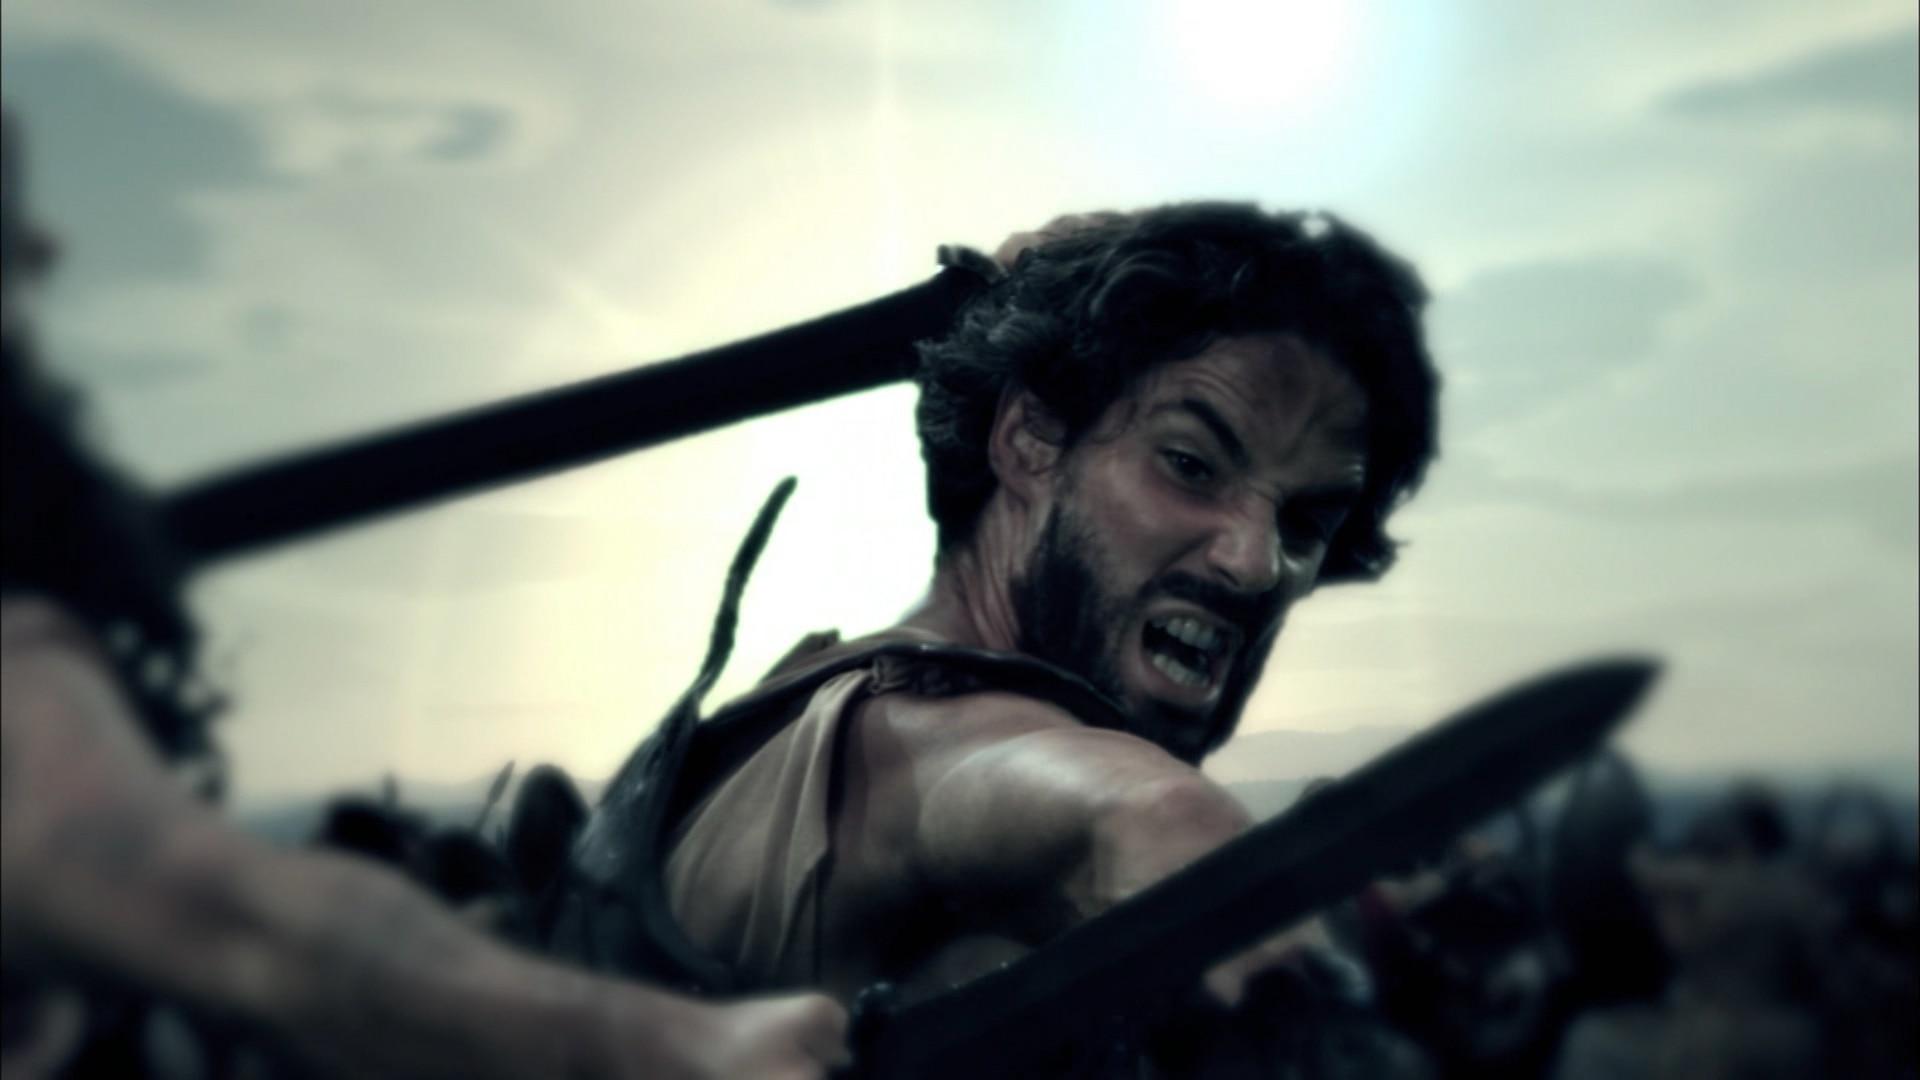 David: Giant Slayer